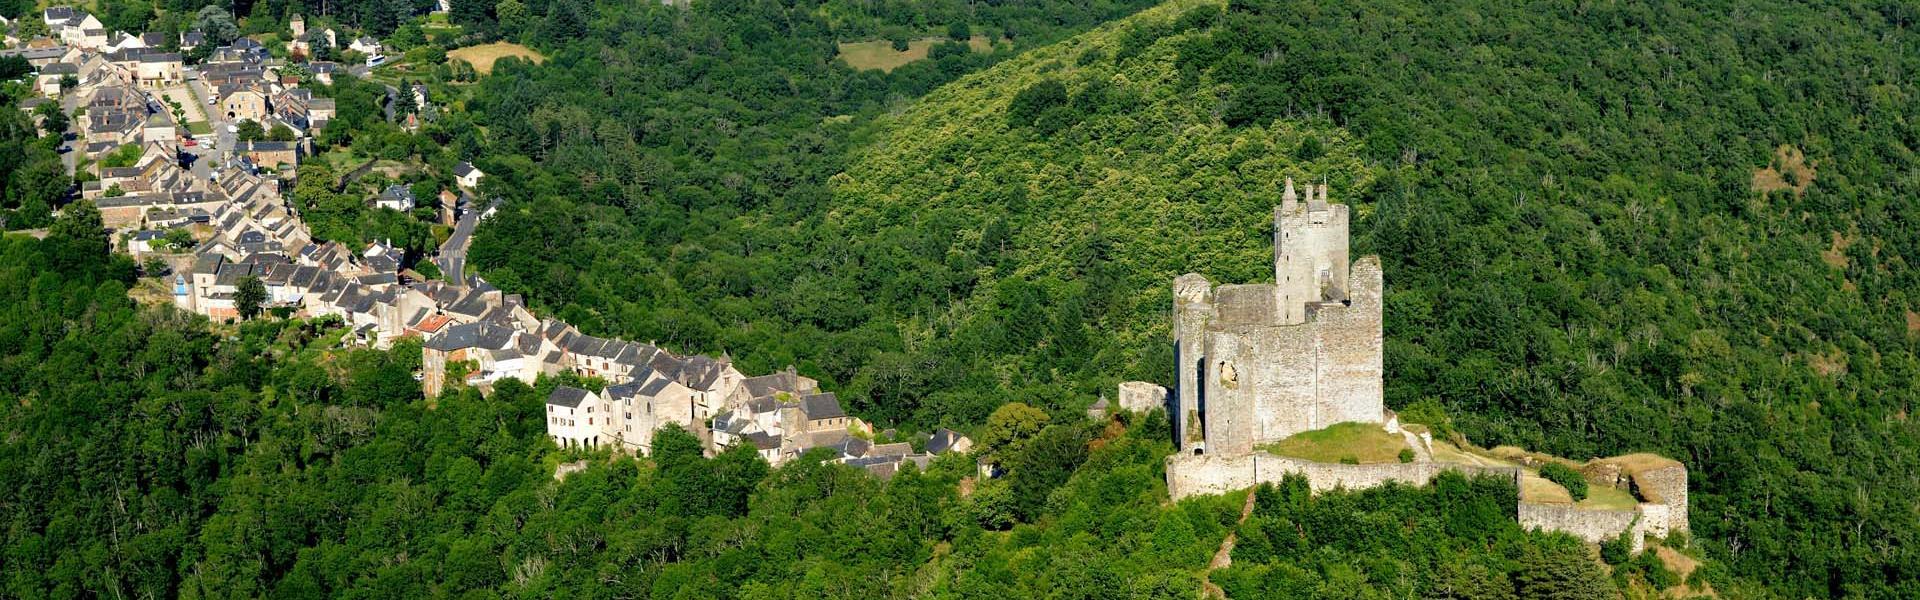 Forteresse de Najac en Aveyron